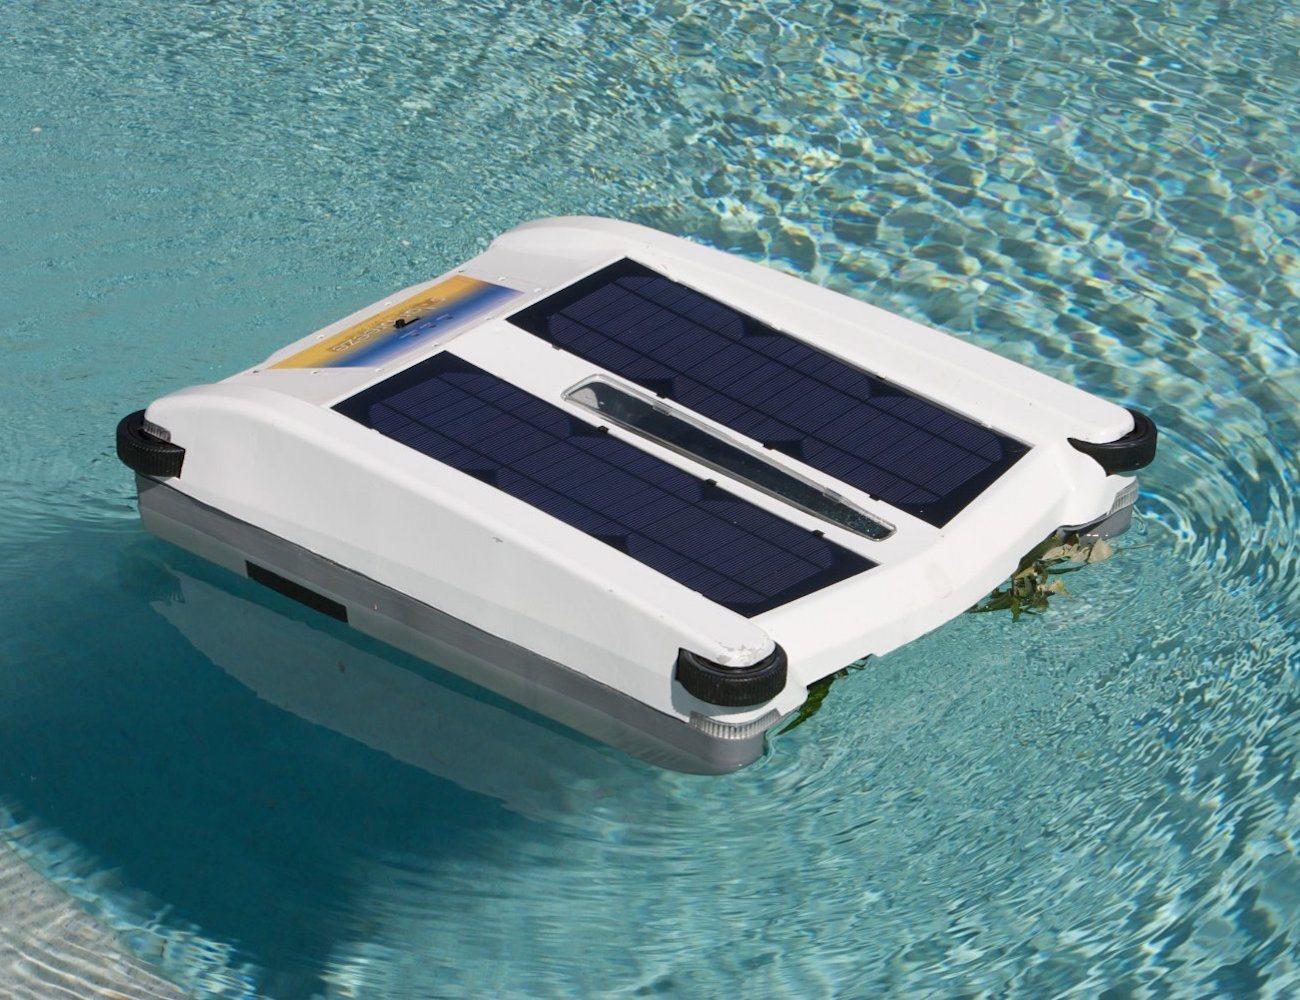 Robotic Solar Pool Skimmer 187 Review